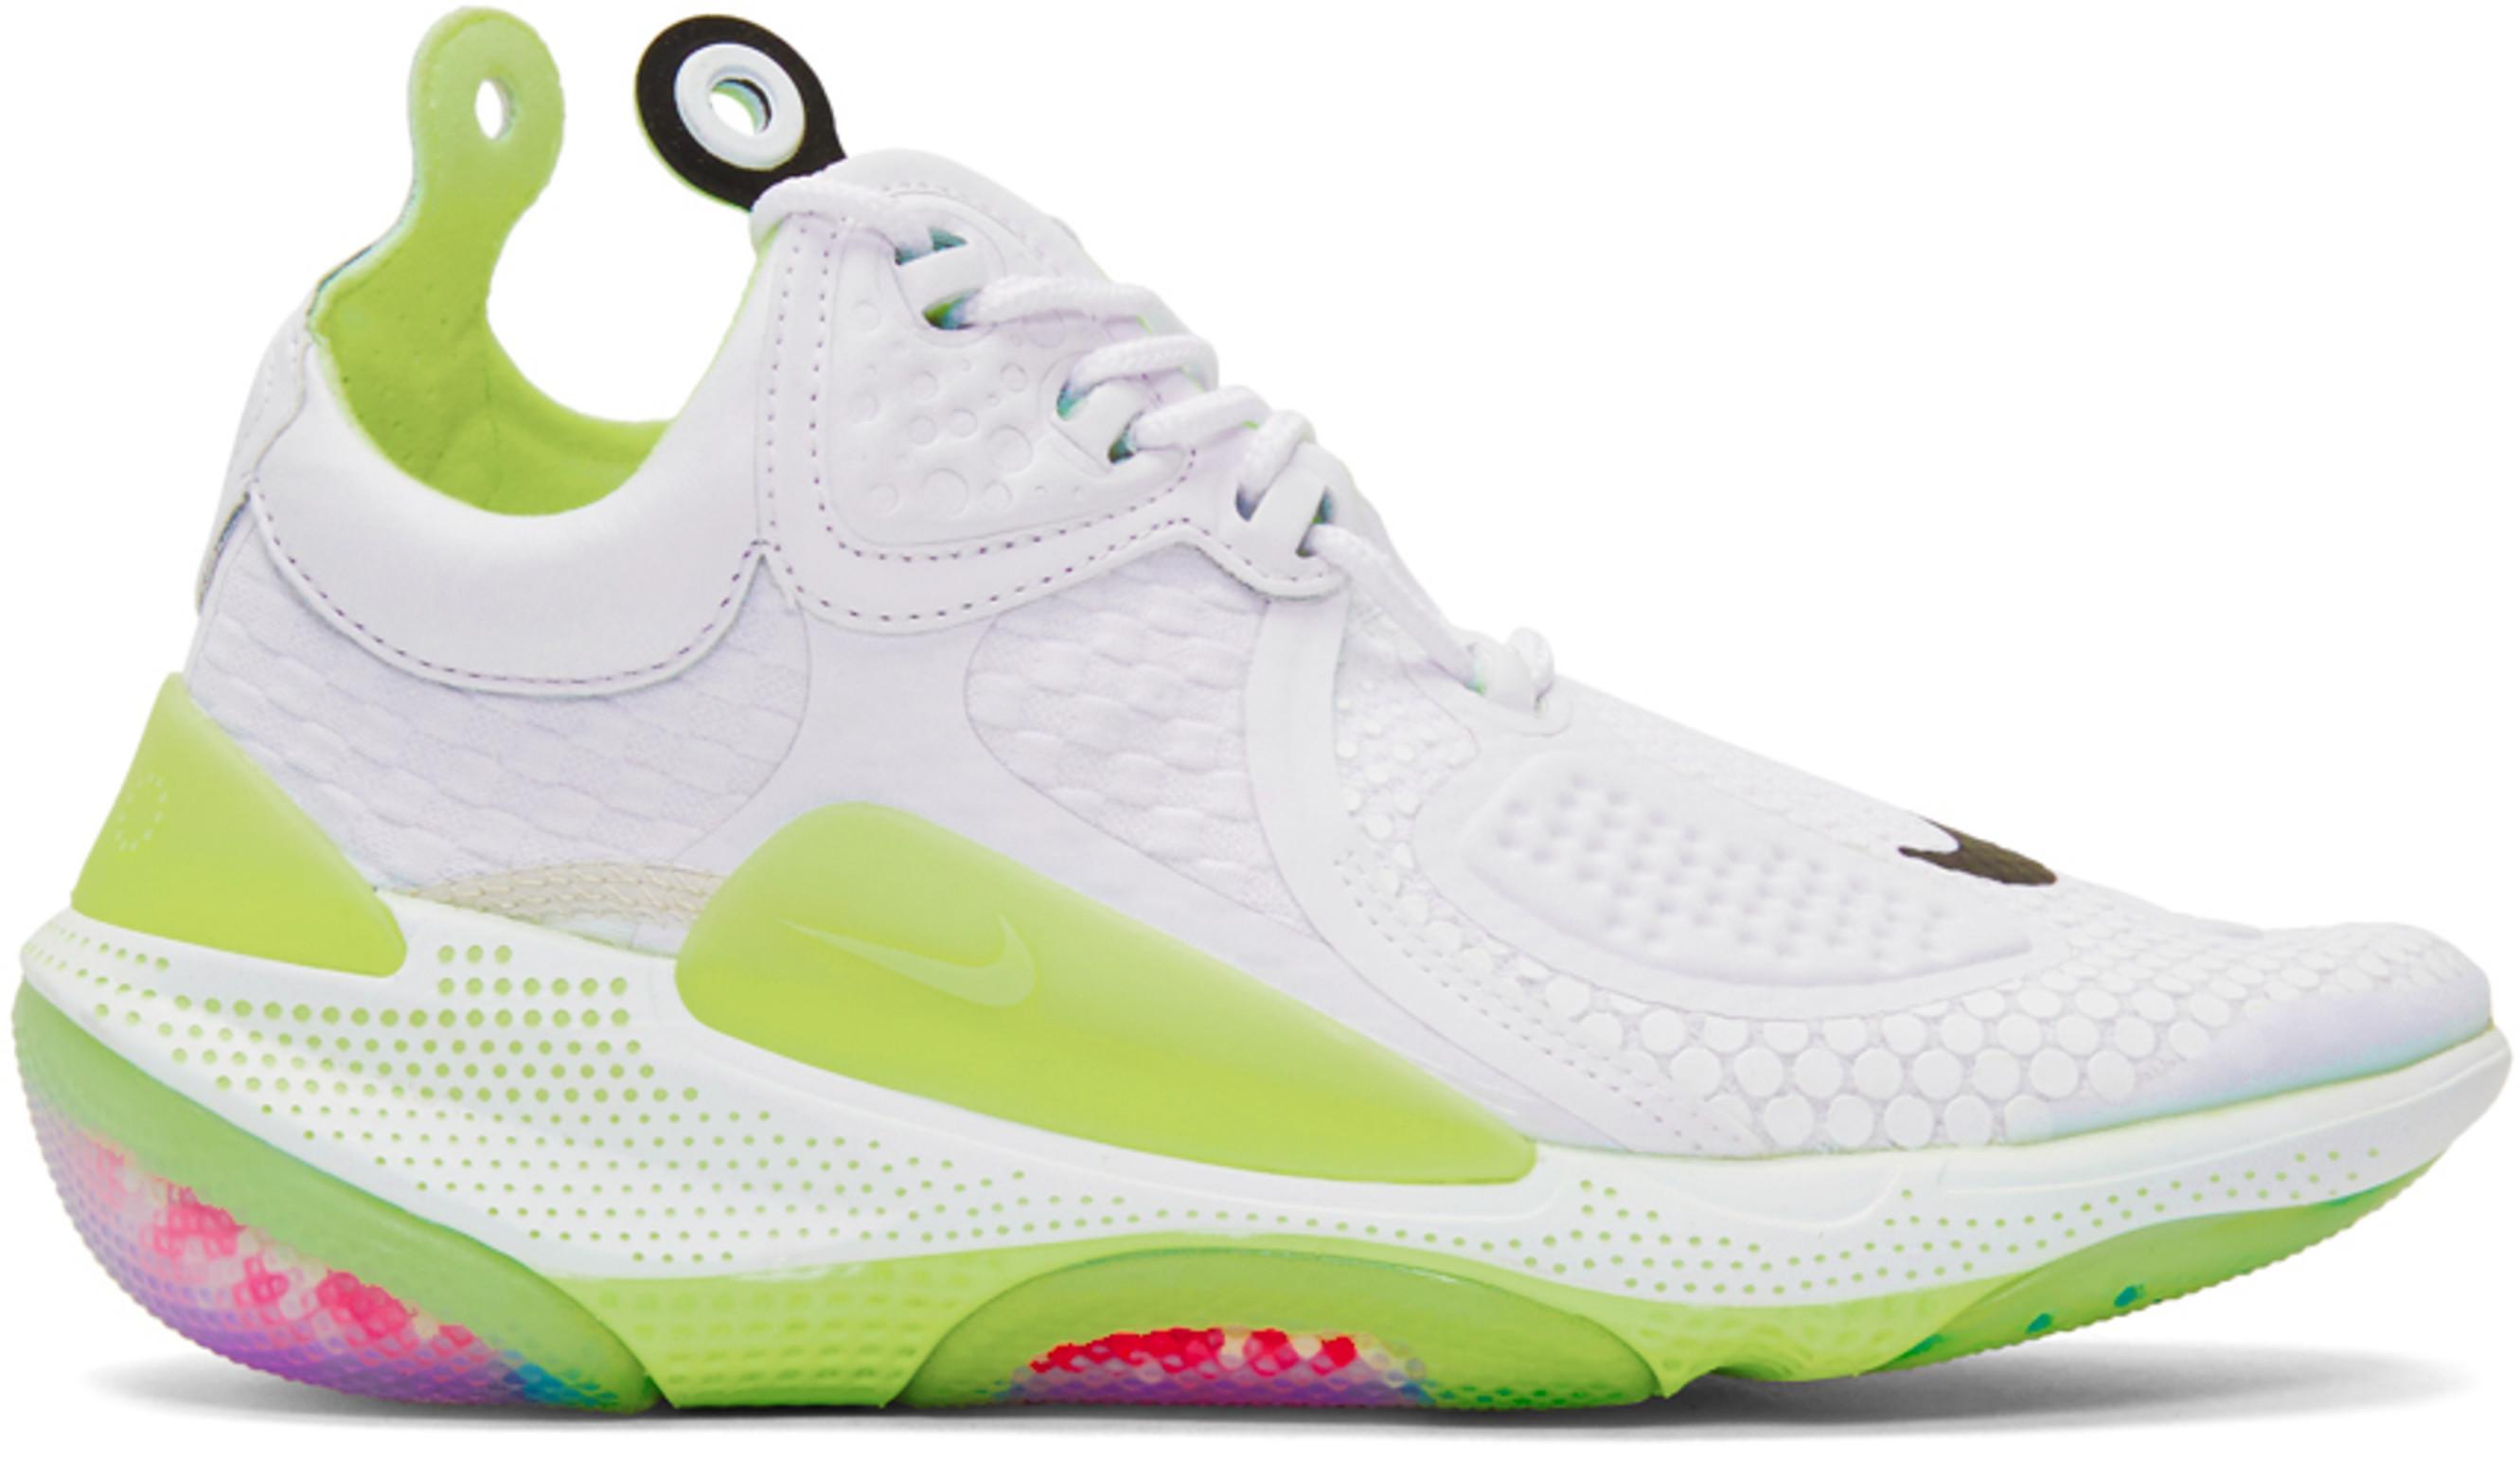 White Joyride CC3 Setter Sneakers